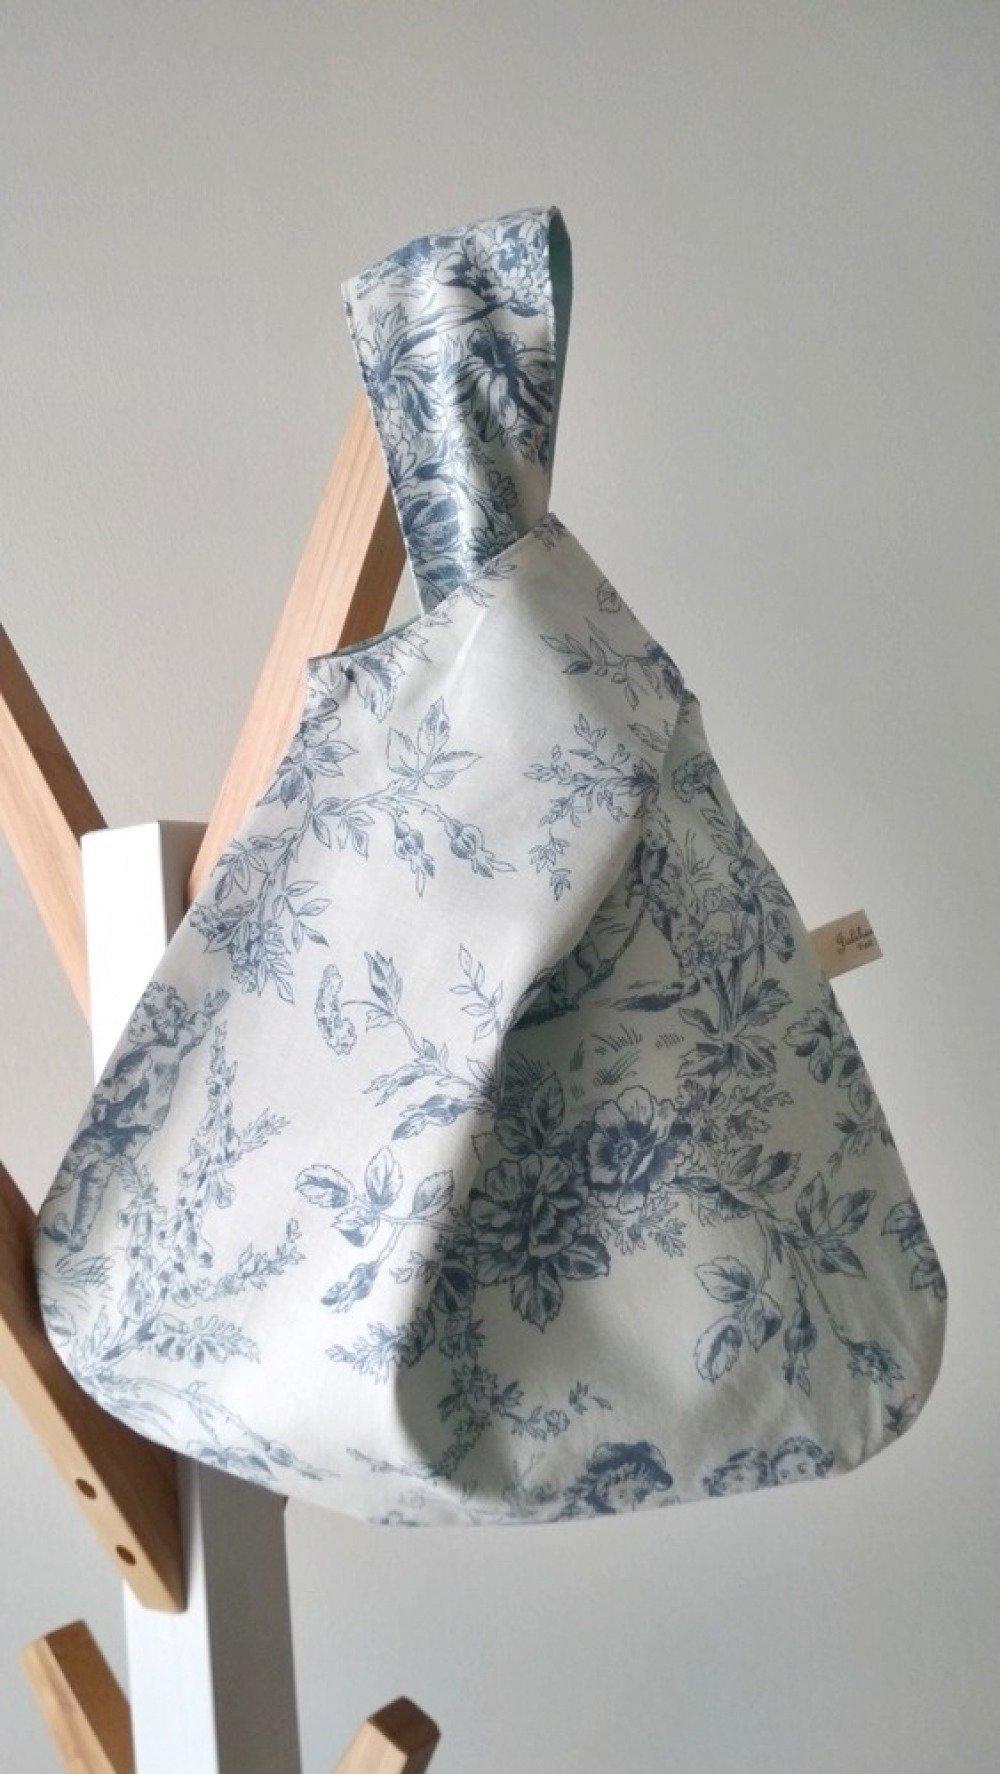 SAC POCHETTE 'One-Knot bag' - Toile de jouy